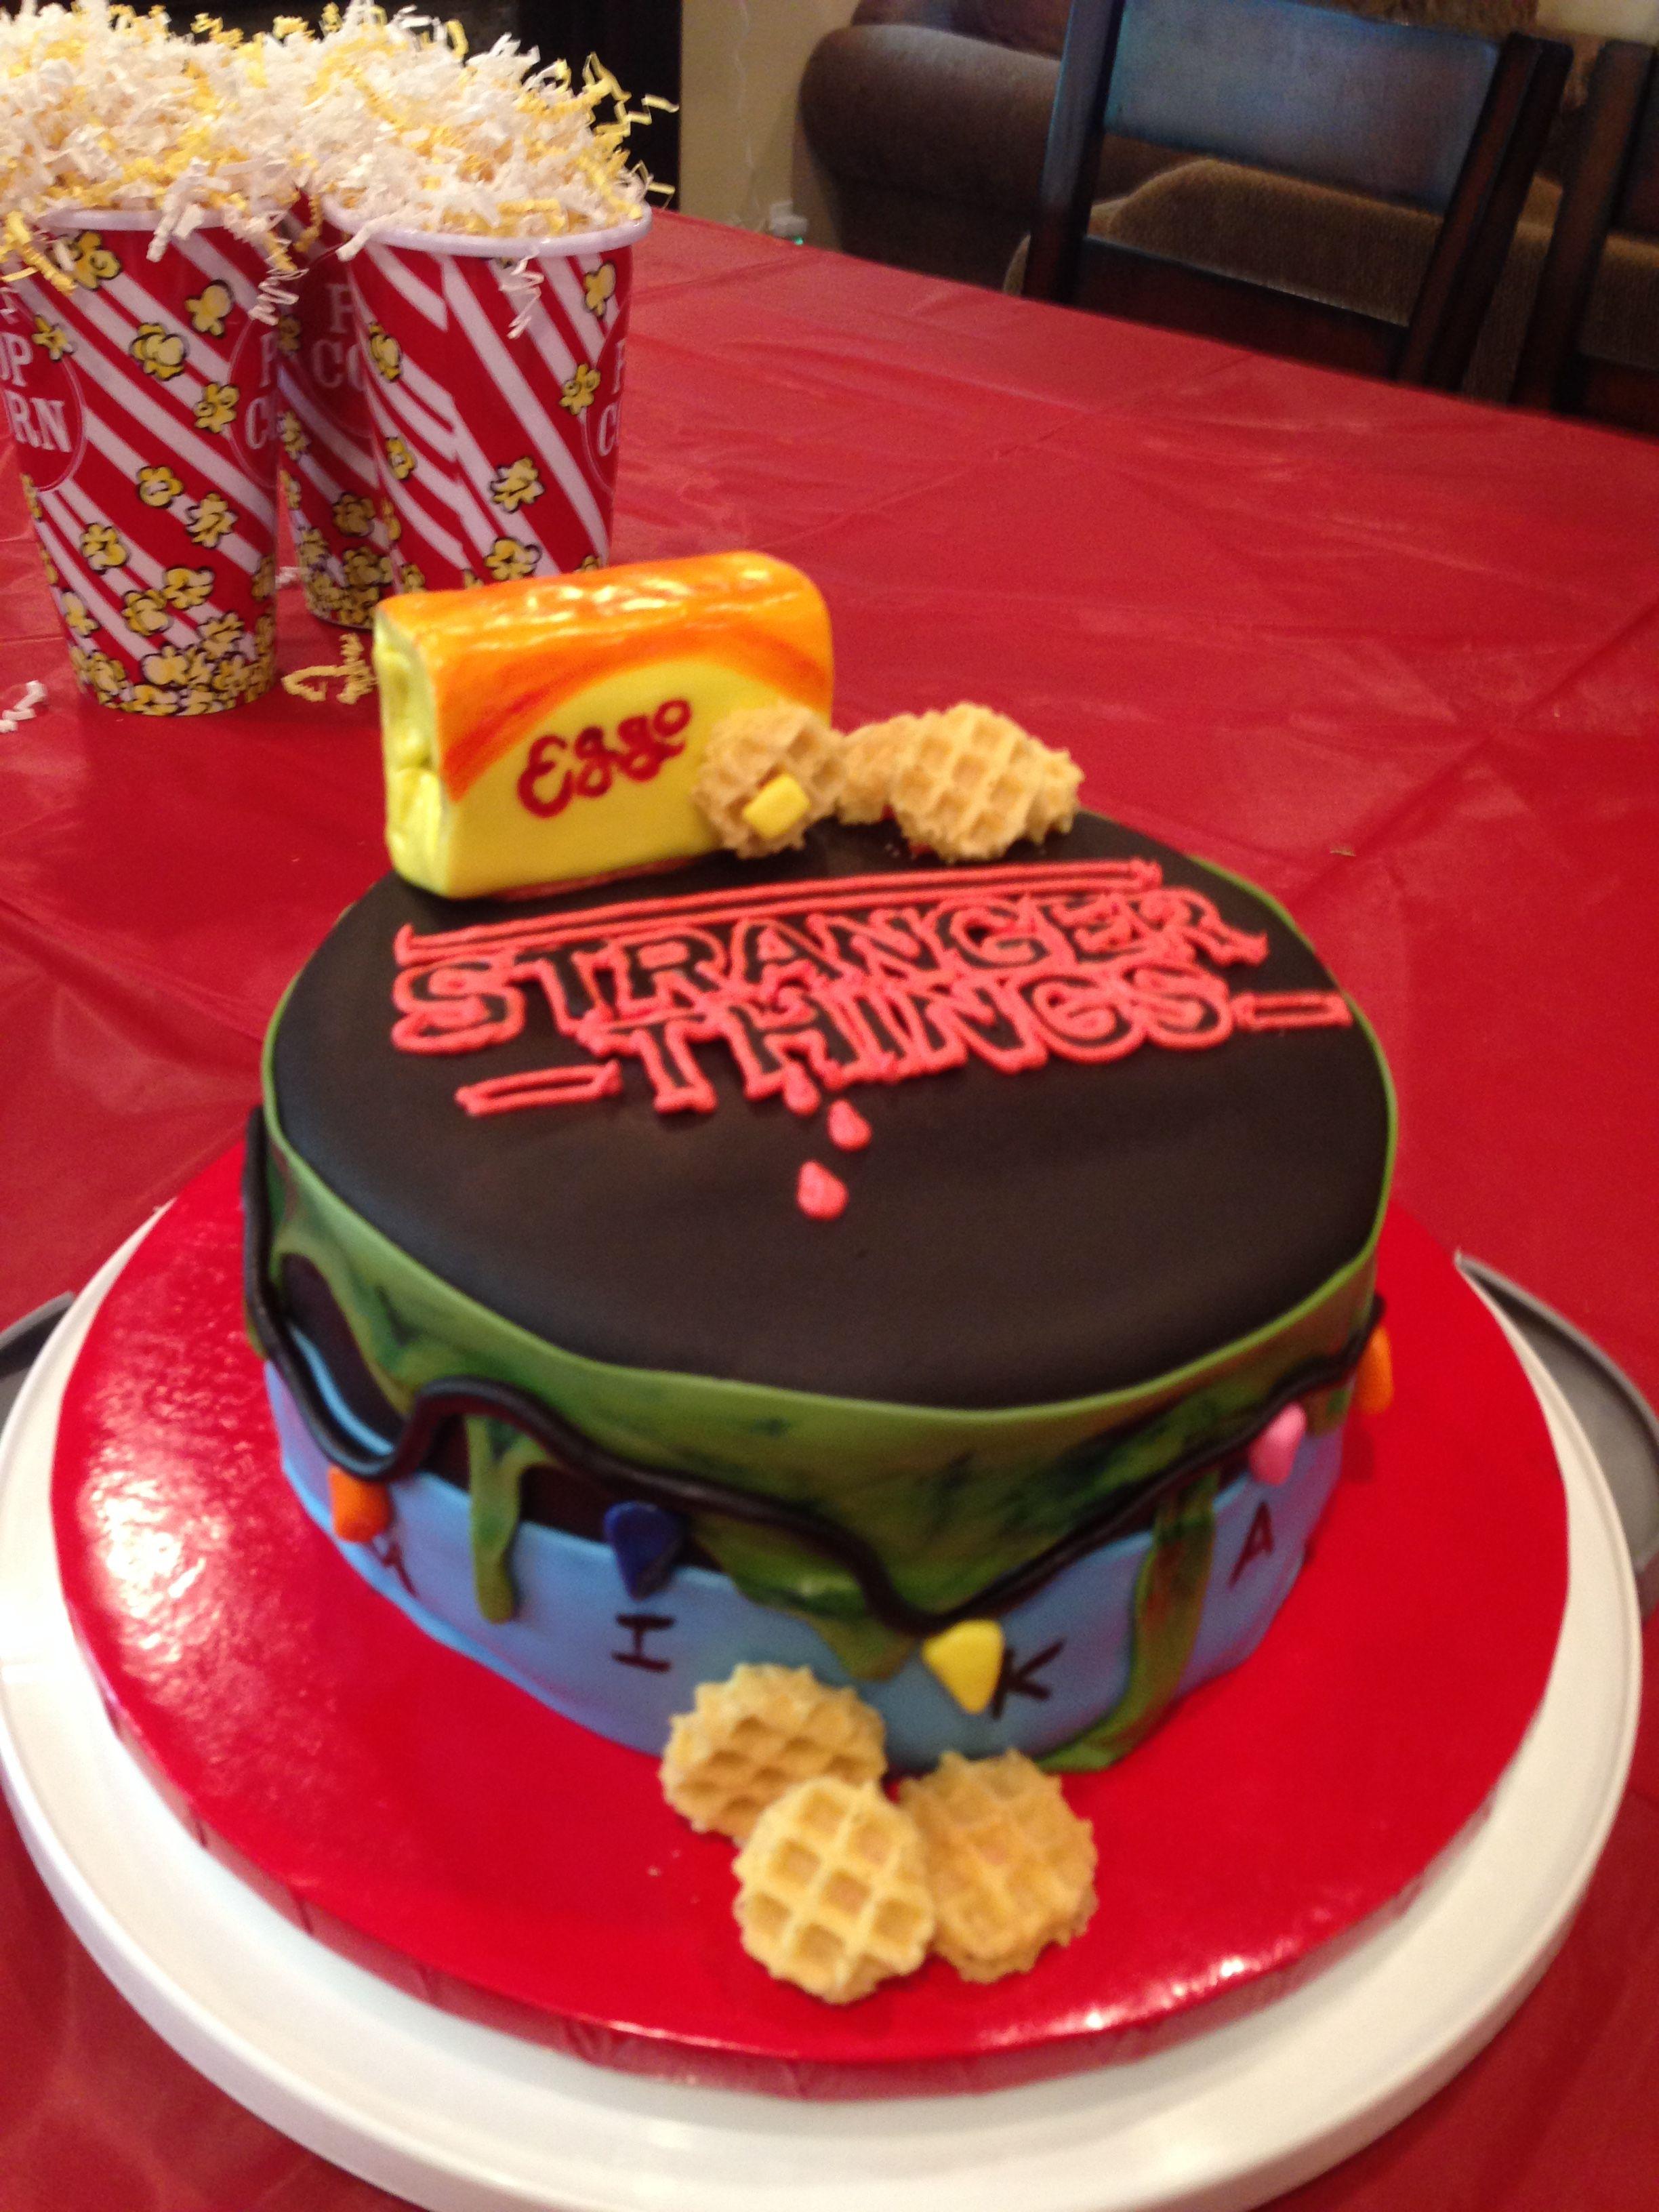 This Is Gonna Be My Bday Cake Stranger Things Stranger Cake